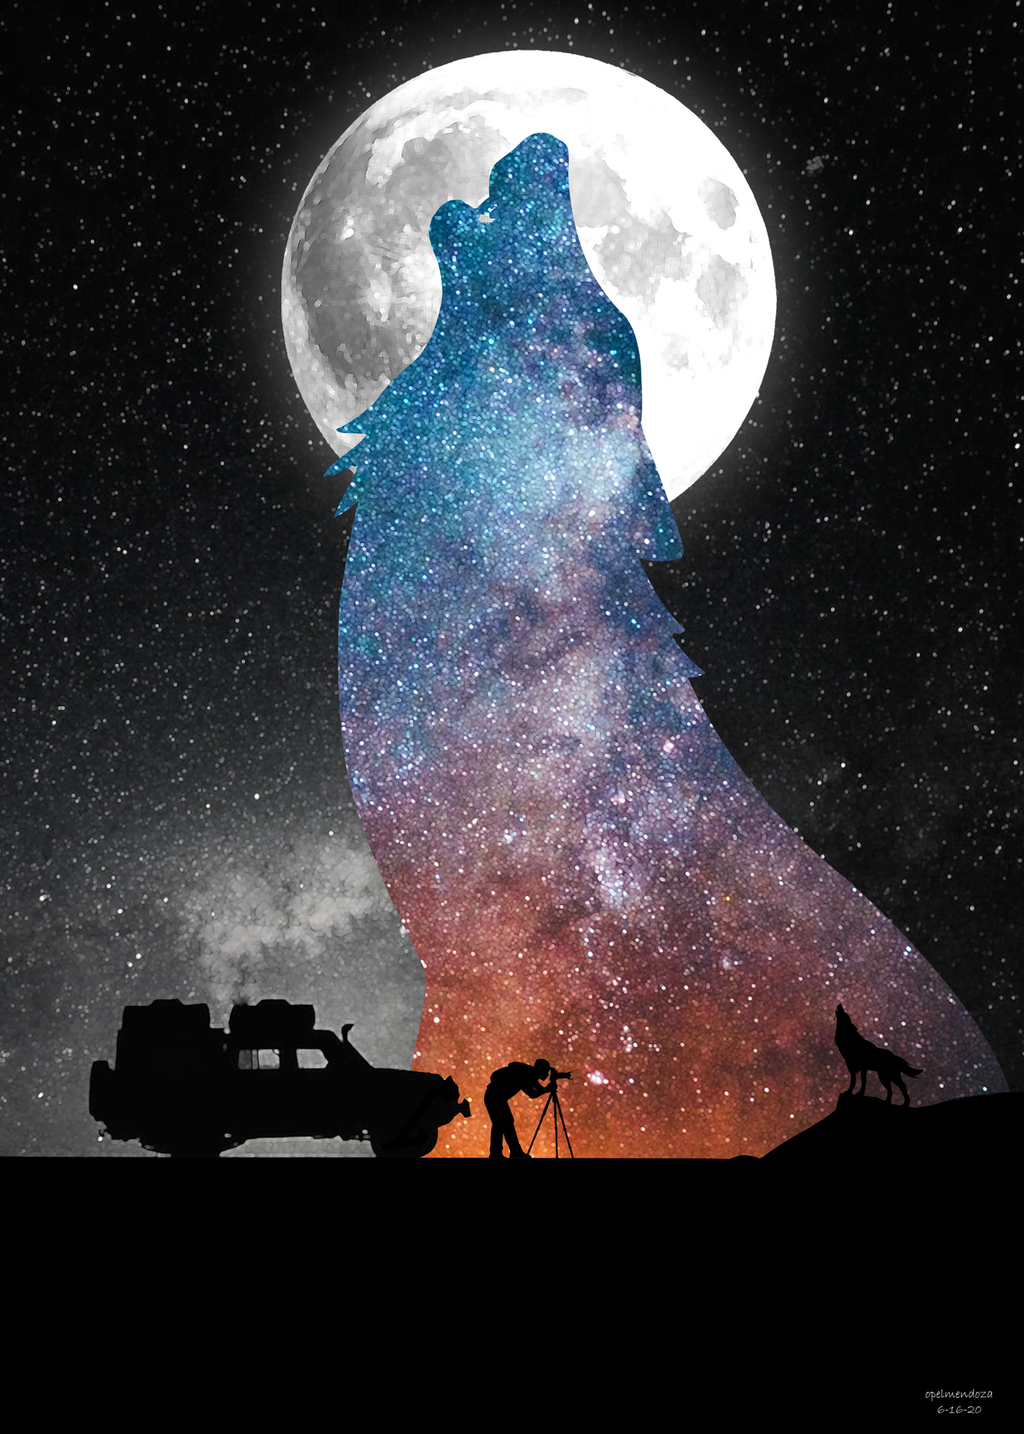 The Wolf via Opel Mendoza